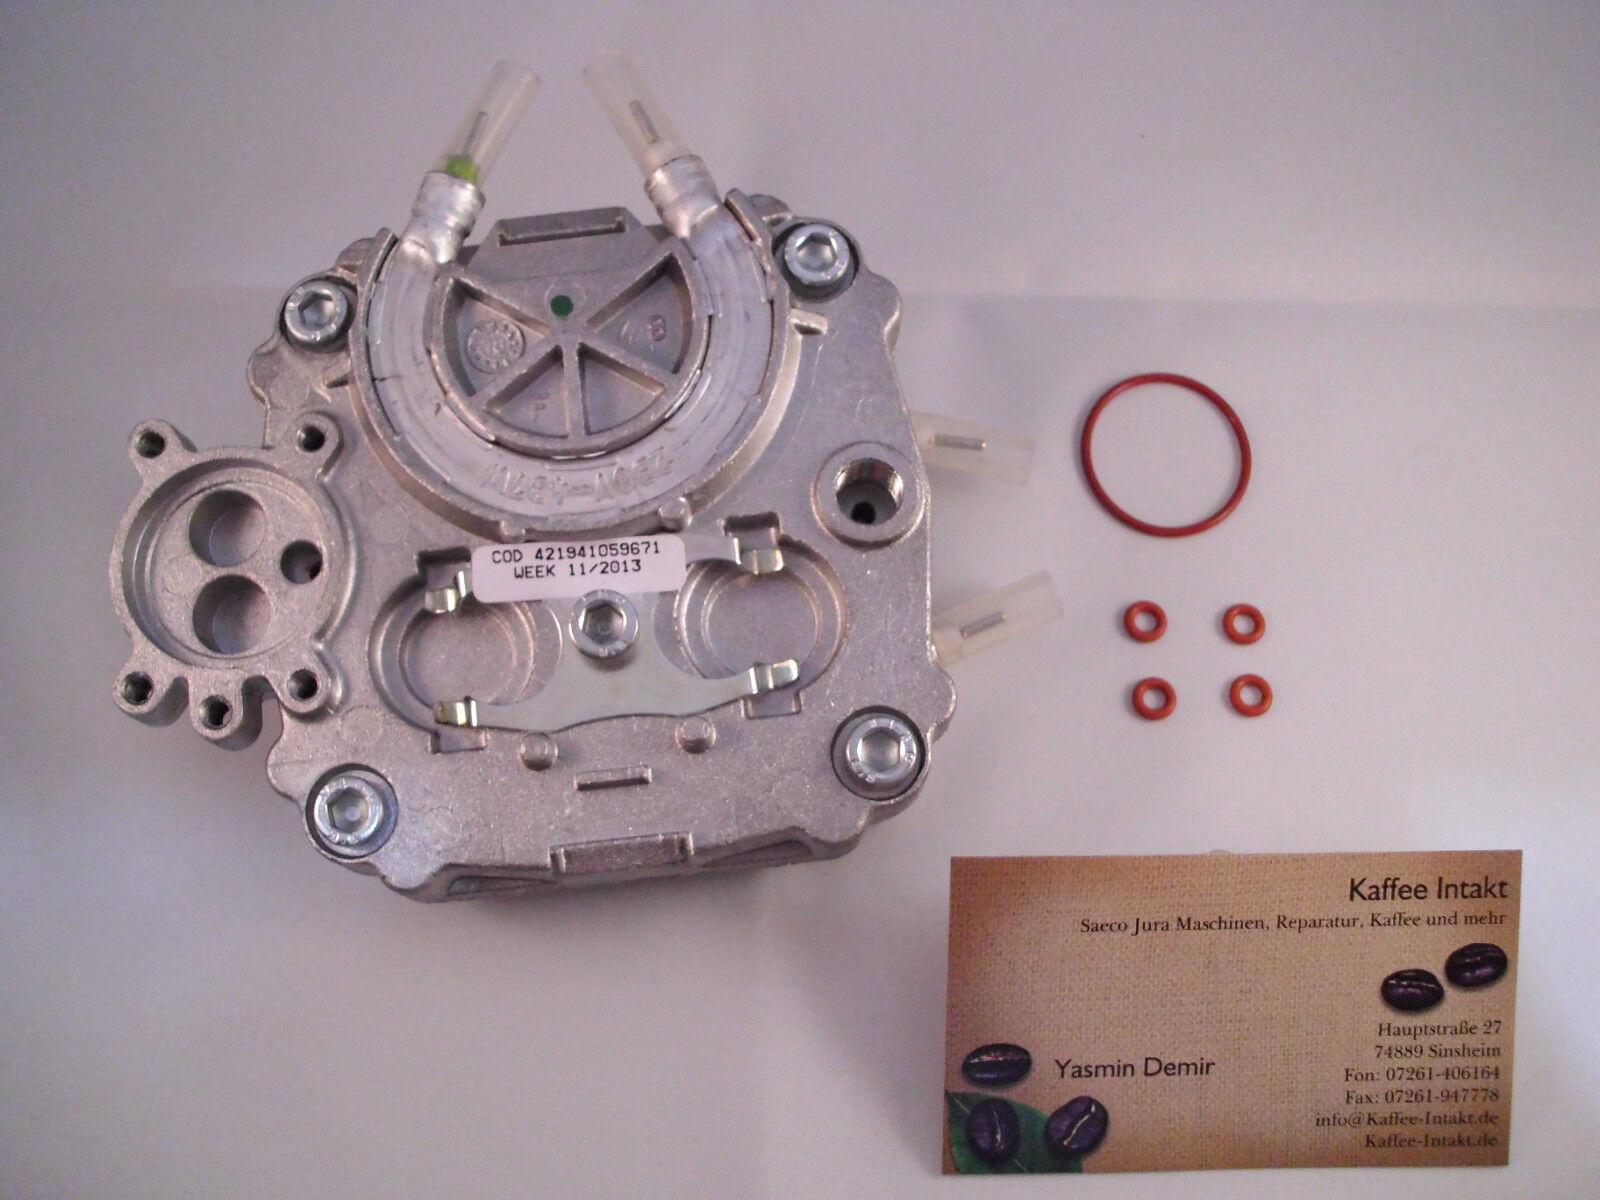 MIELE Boiler CVA 620 nouveau chauffe-eau + joints